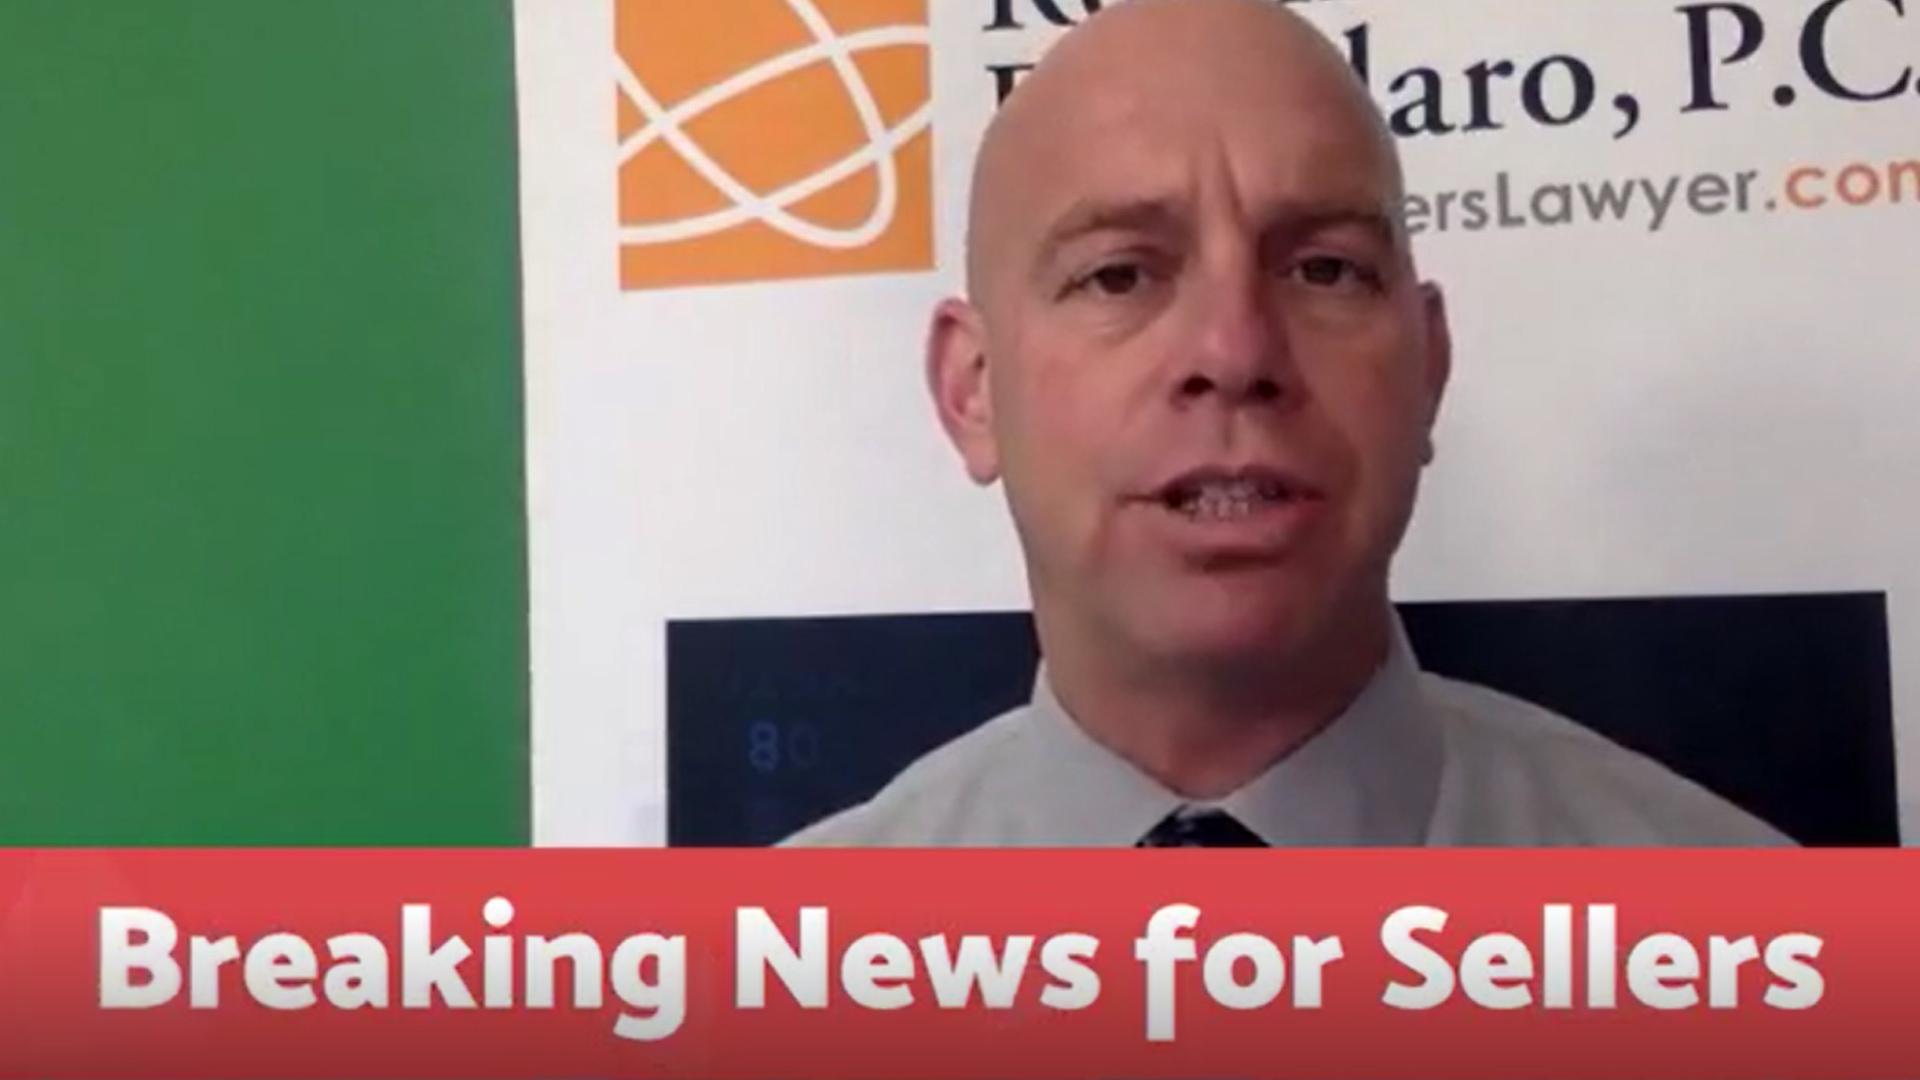 Breaking News for Sellers 11-21-18